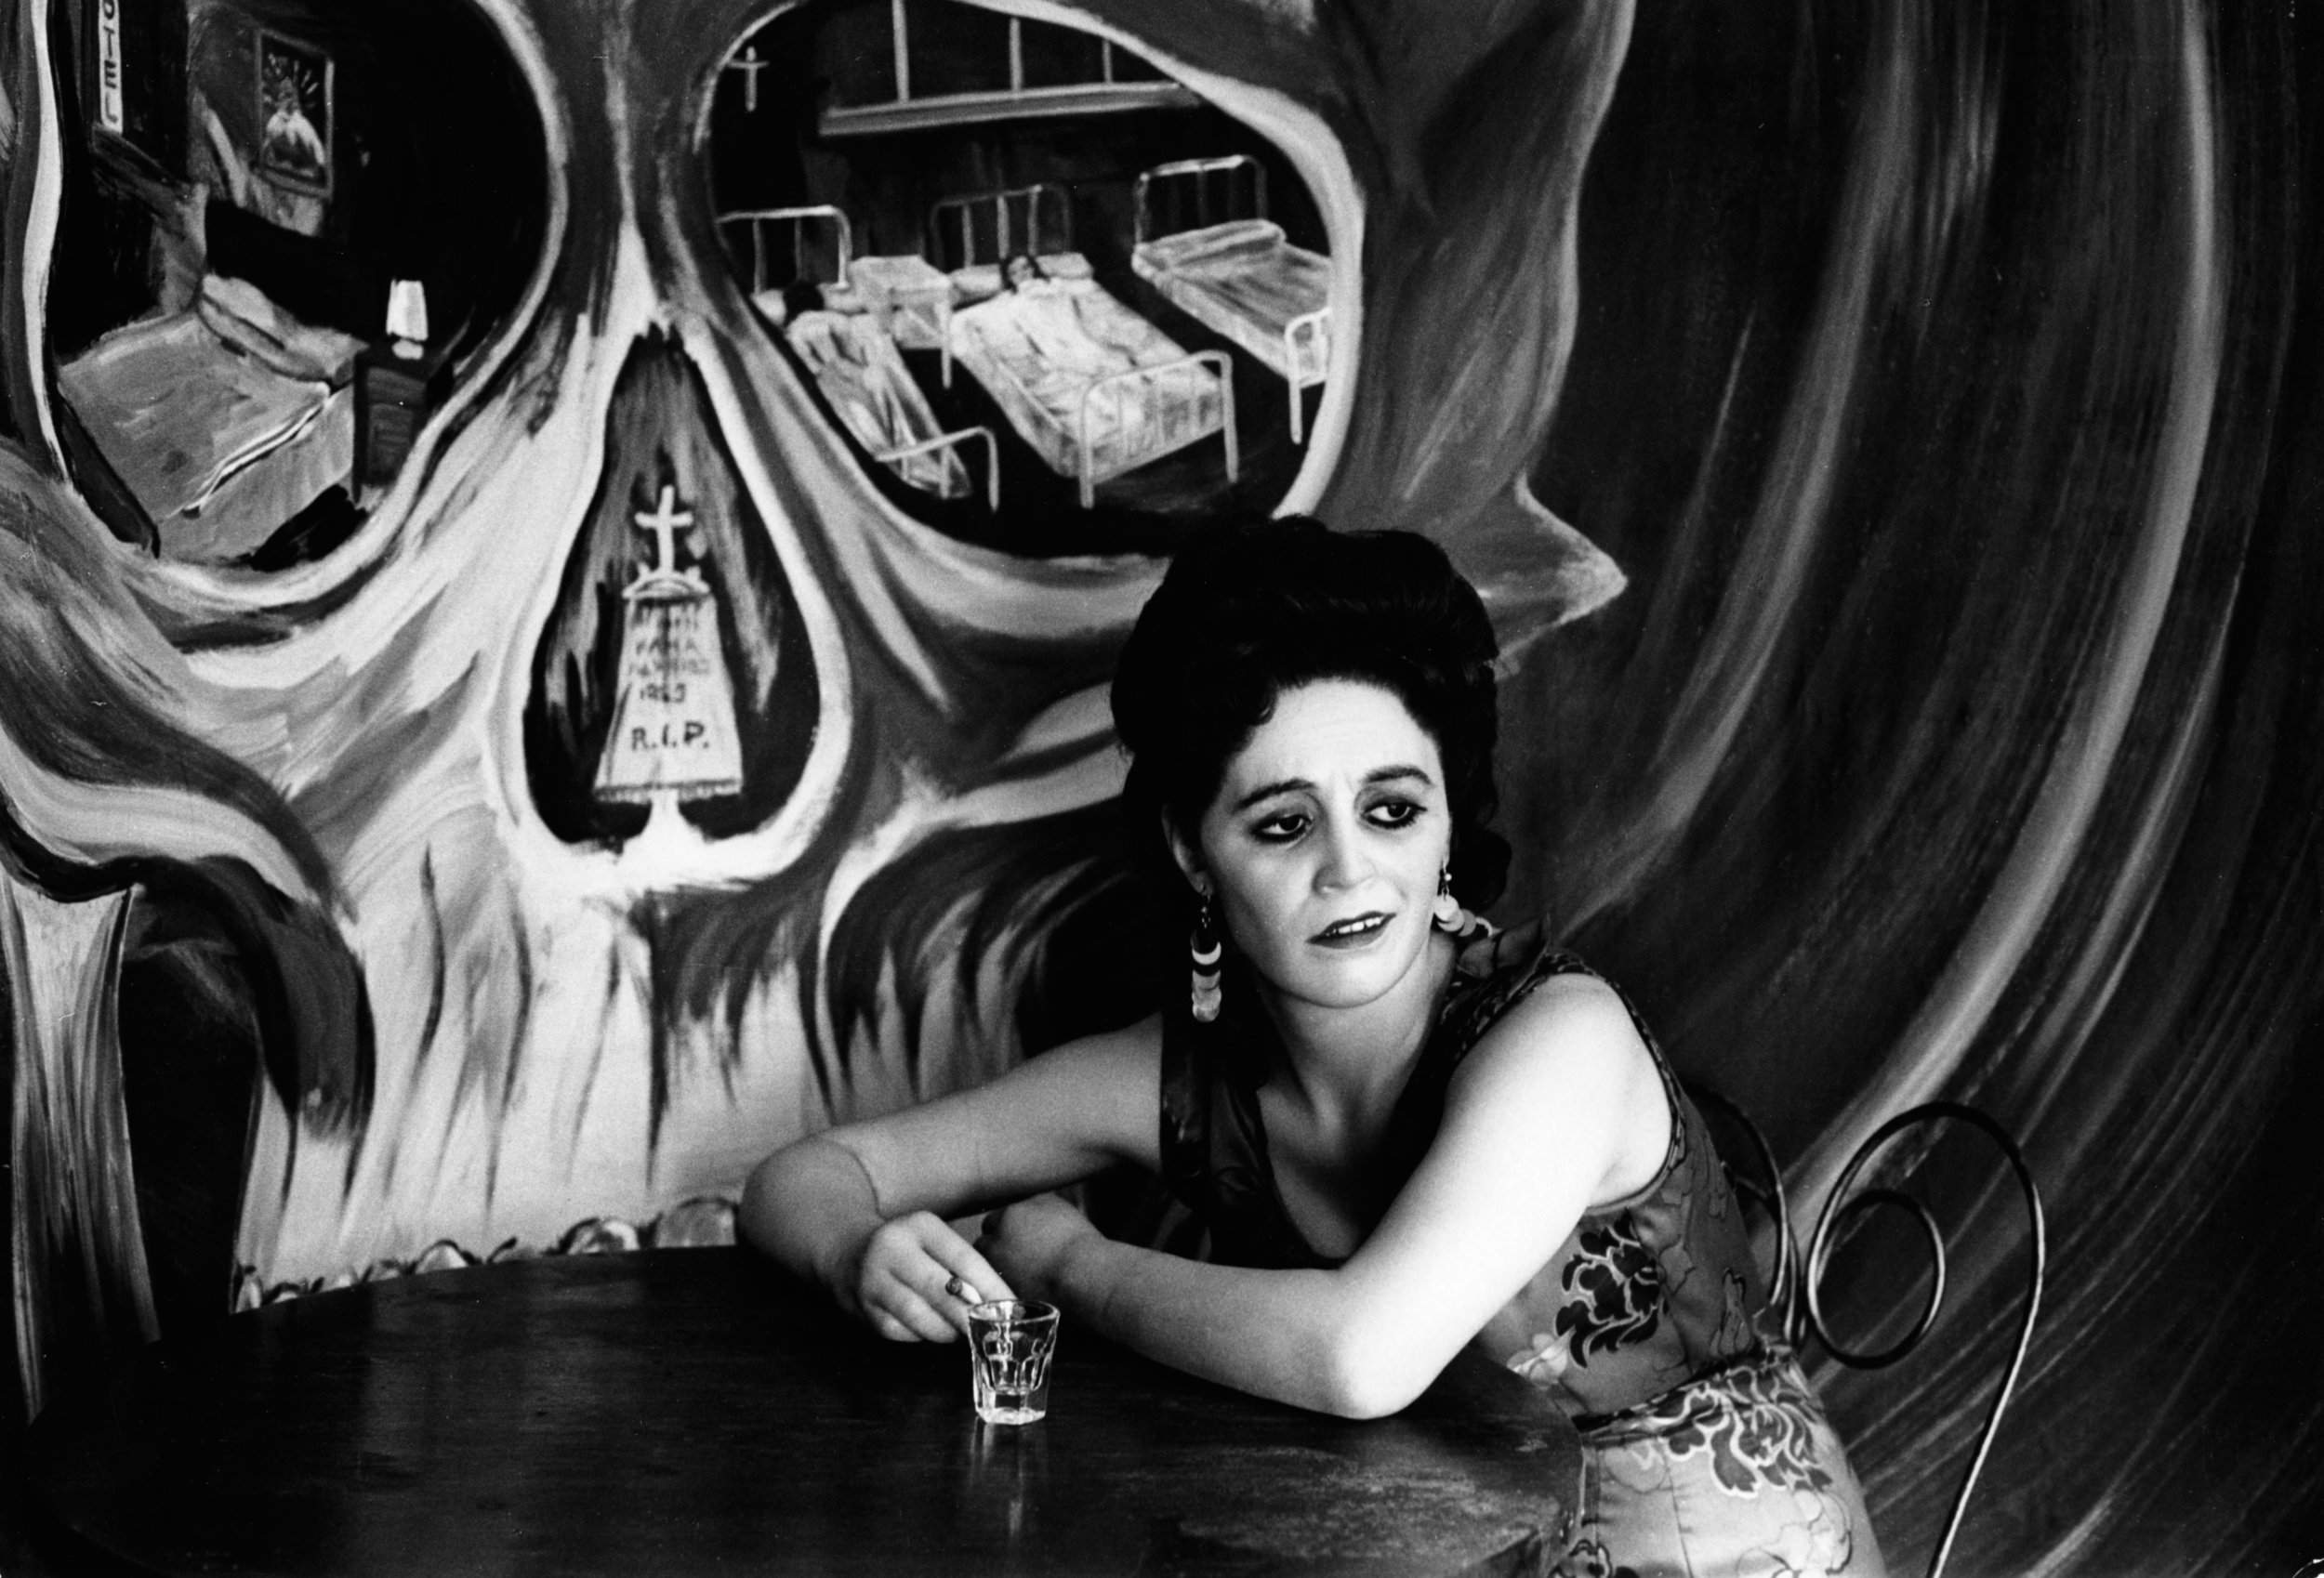 Graciela Iturbide    Mexico DF , 1972 16 x 20 inch Silver Gelatin Print